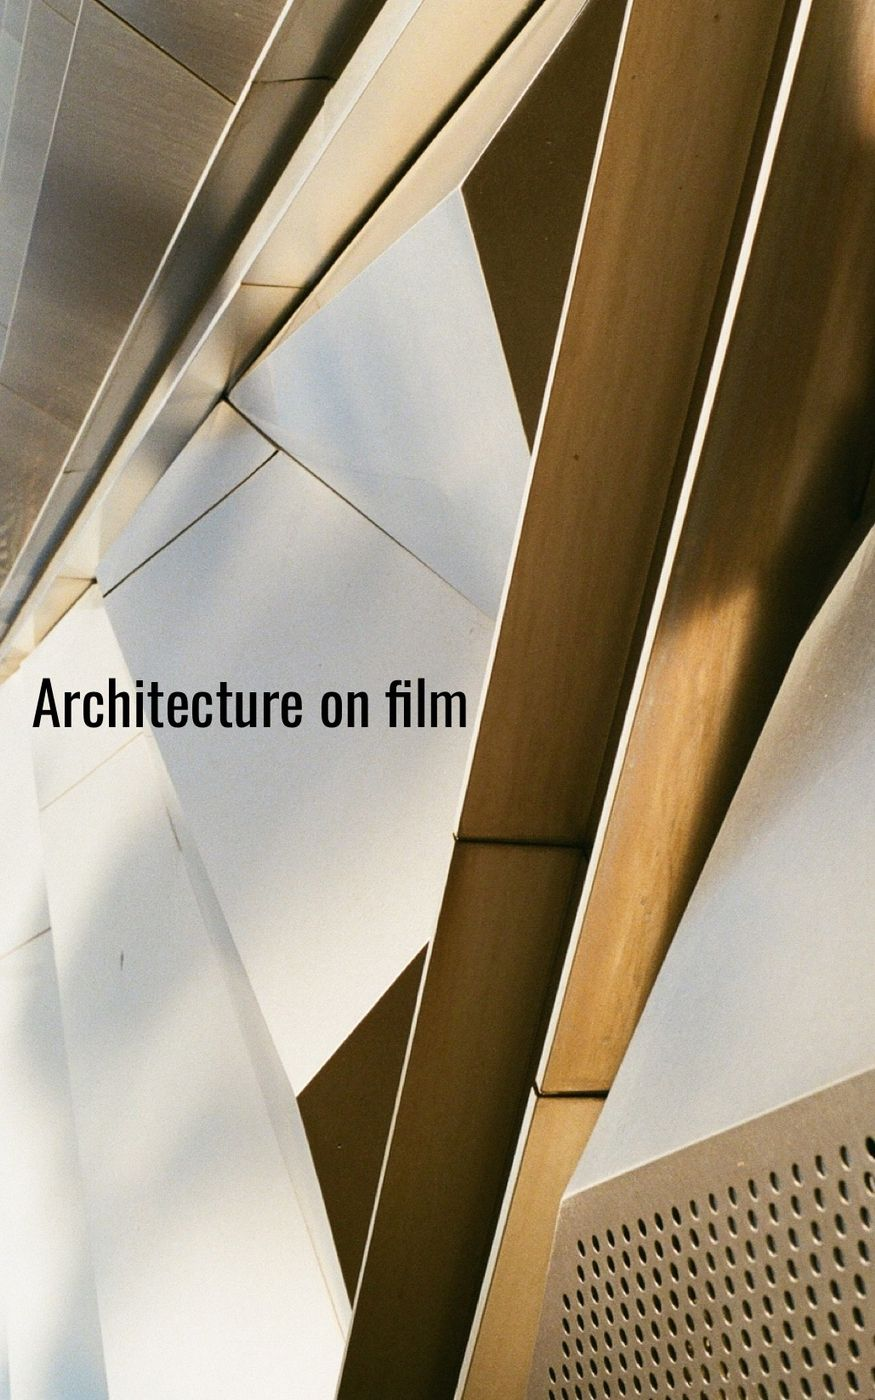 Film: Kodak UltraMax 400  Location: Eli and Edythe Broad Art Museum